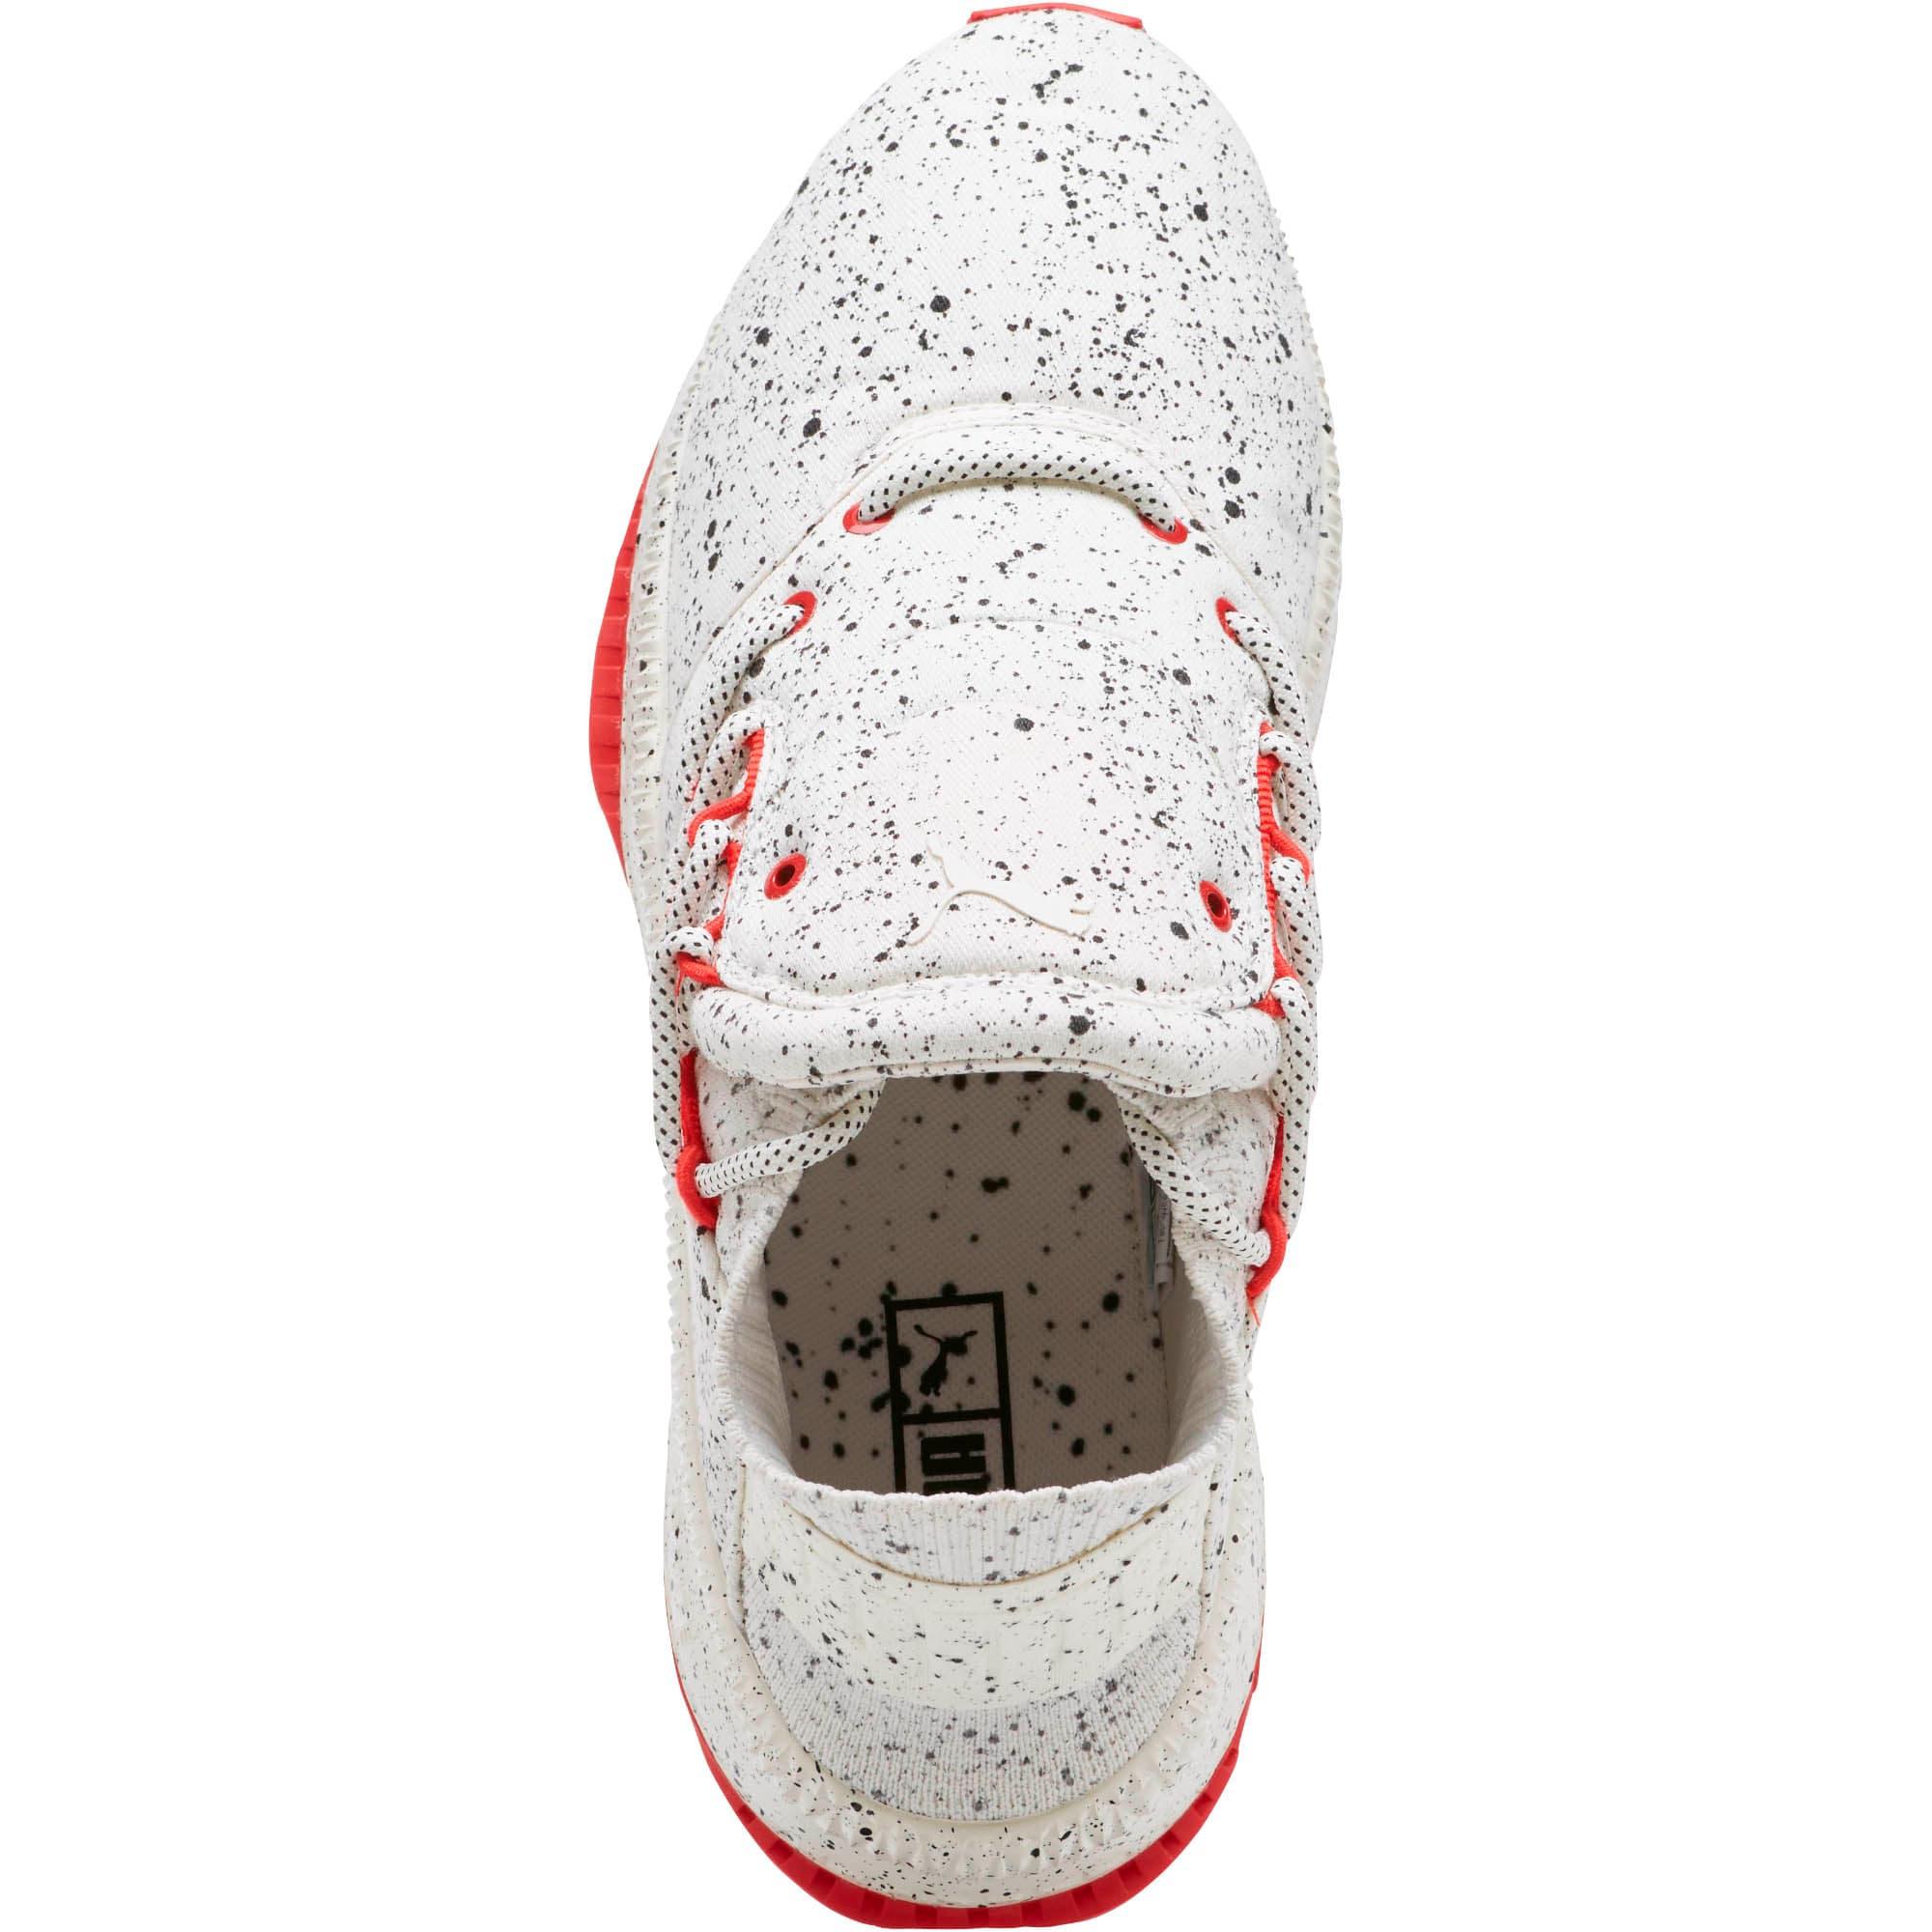 Puma Tsugi Shinsei K Sneakers Casual White Mens